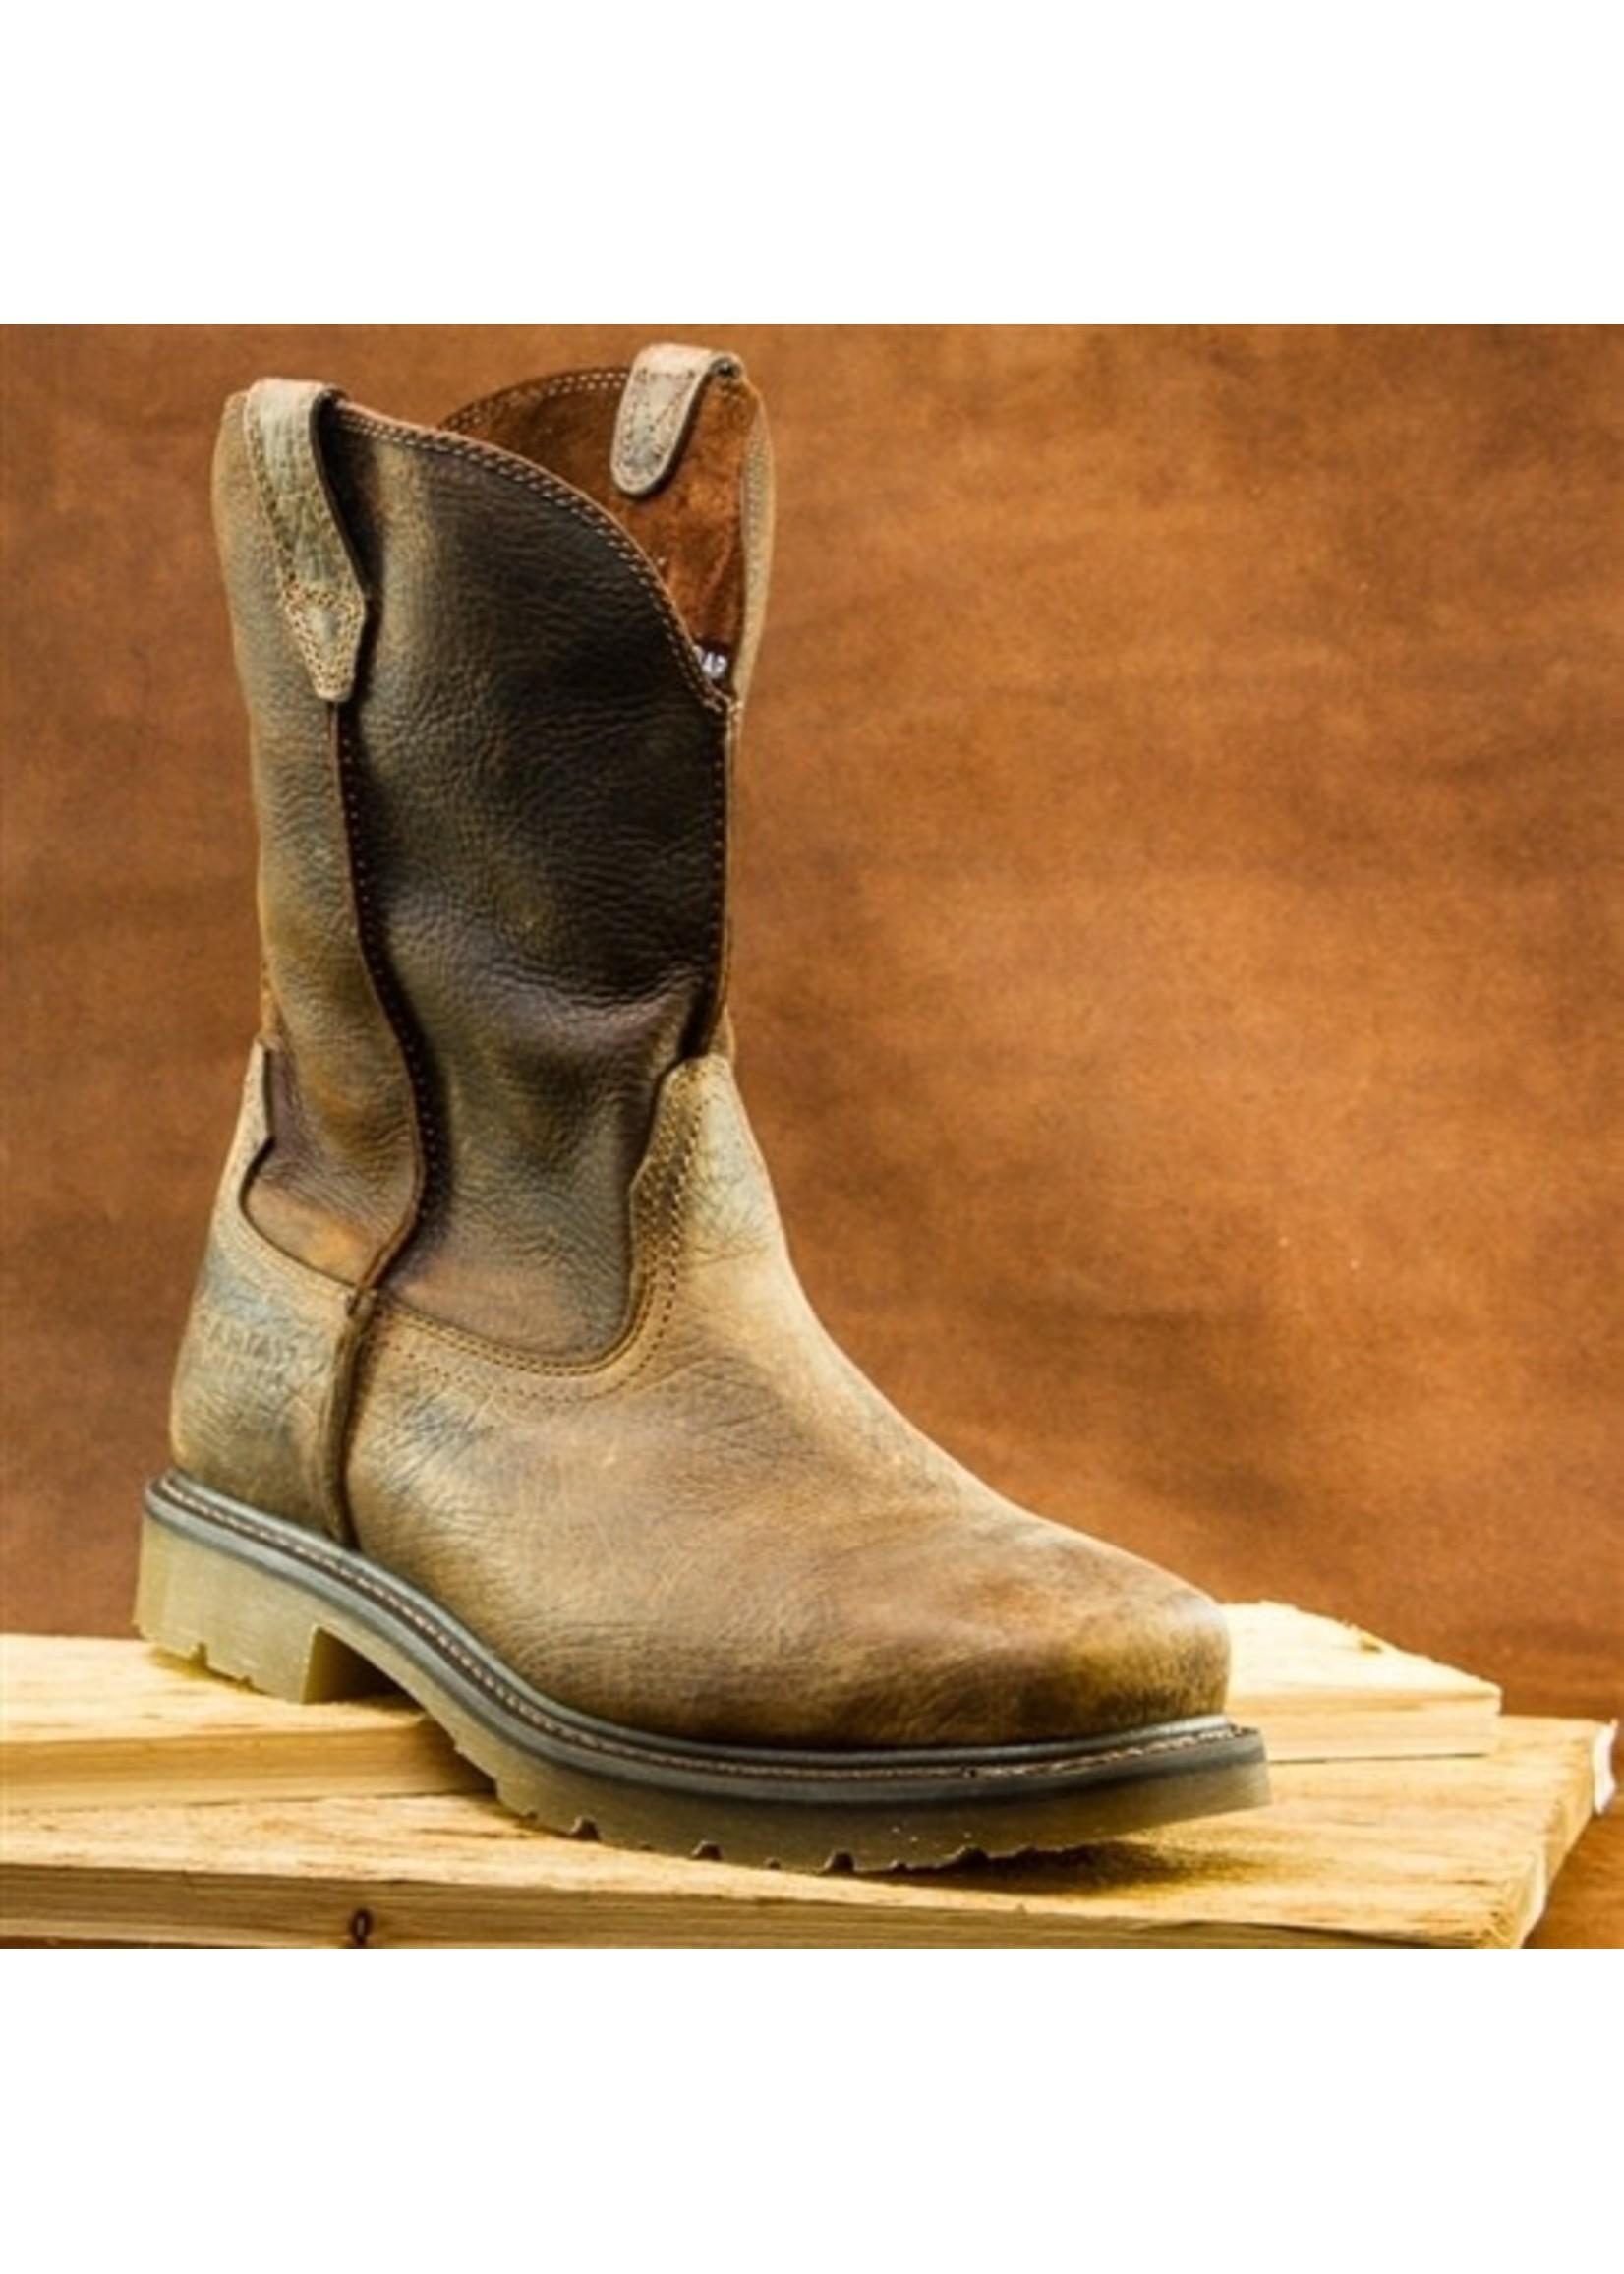 Ariat Rambler Work Pull On Steel Toe 10008642